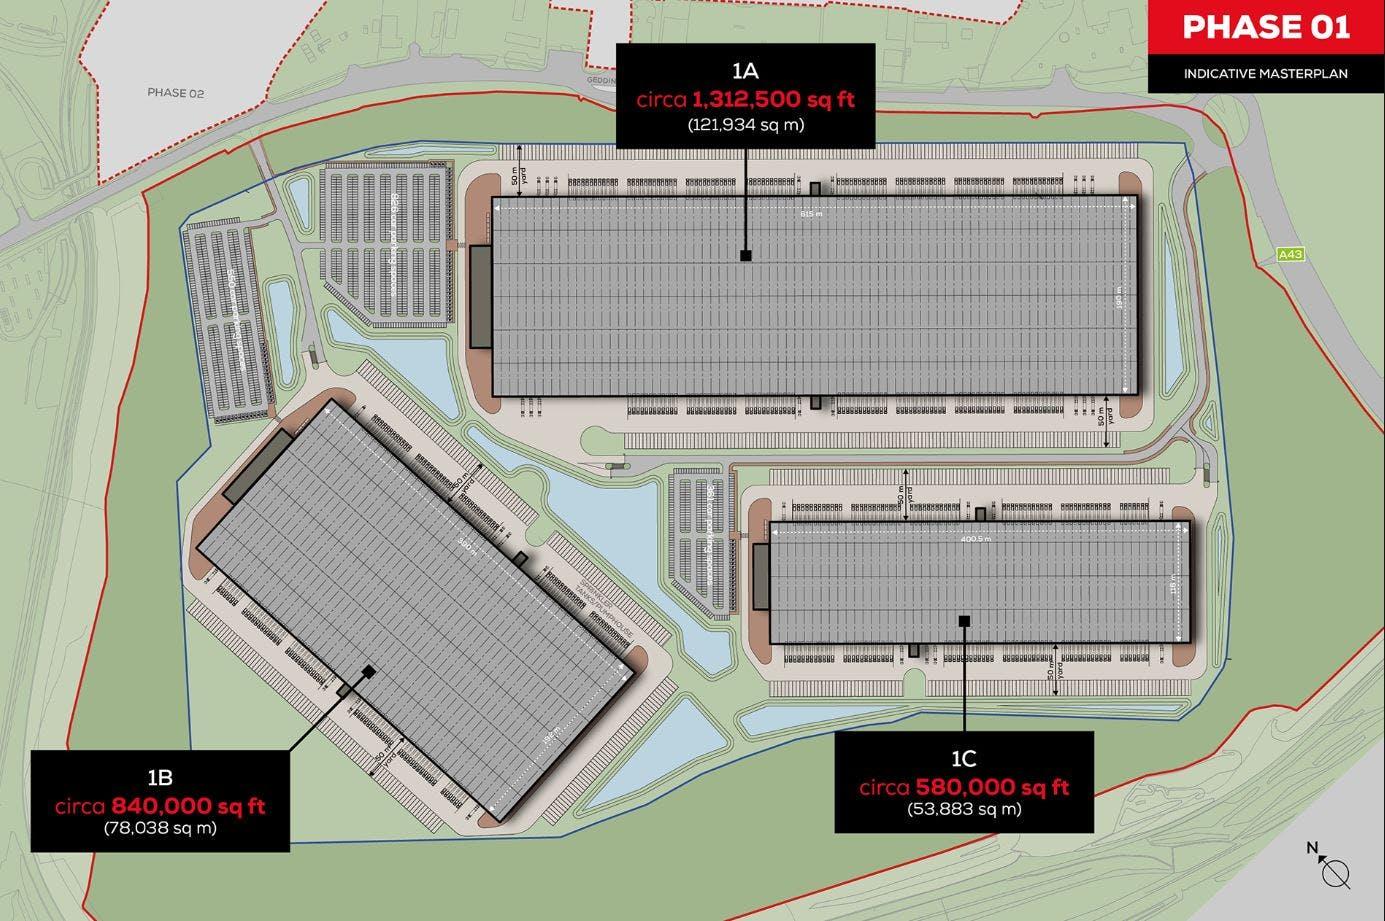 Midlands Logistics Park, Northamptonshire, Distribution Warehouse / Industrial (Multi Let Scheme) To Let - MLP Masterplan - PHASE 1.JPG